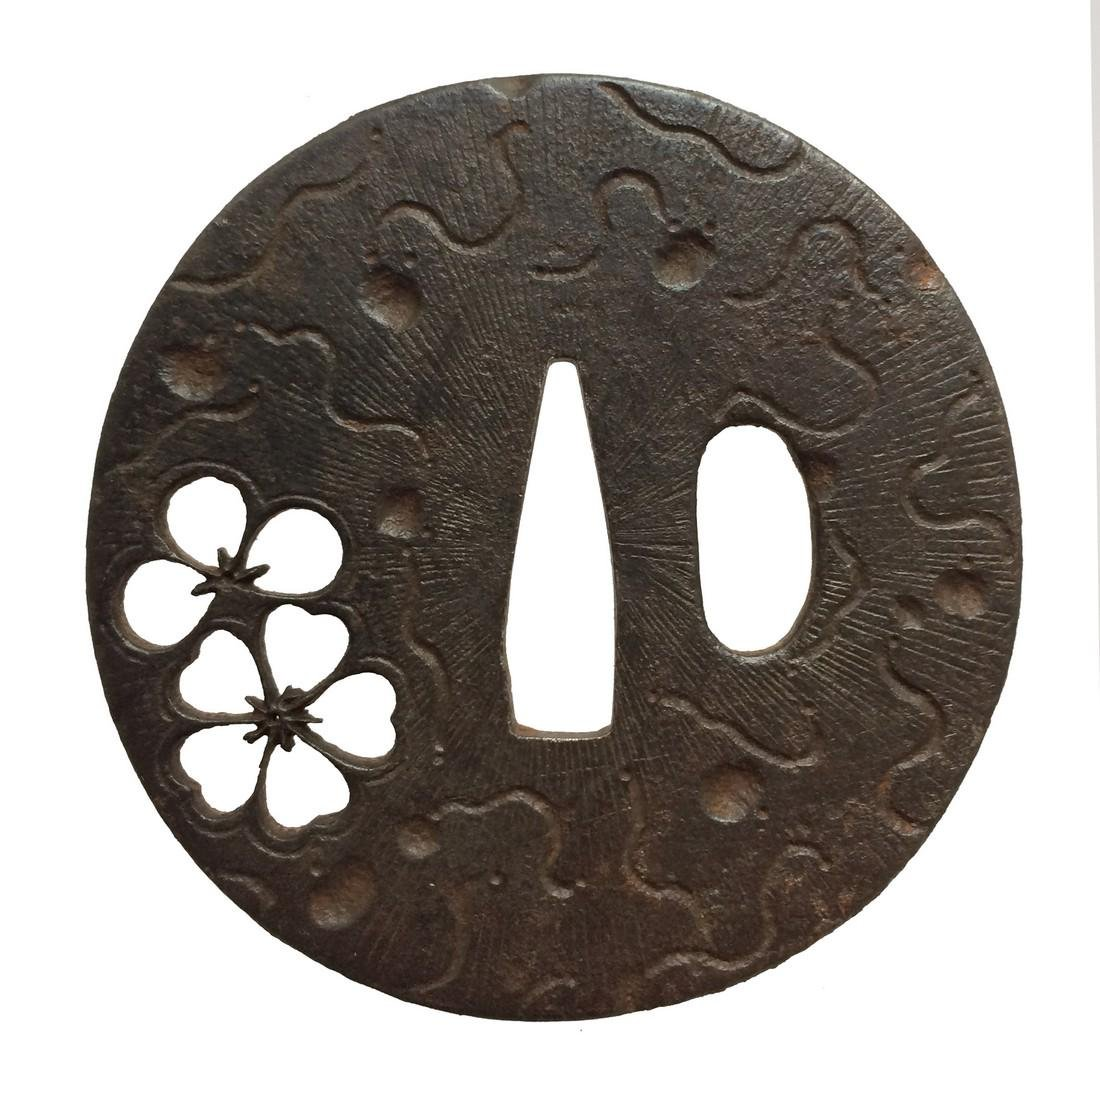 Iron sukashi tsuba with plum and cherry blossoms motif